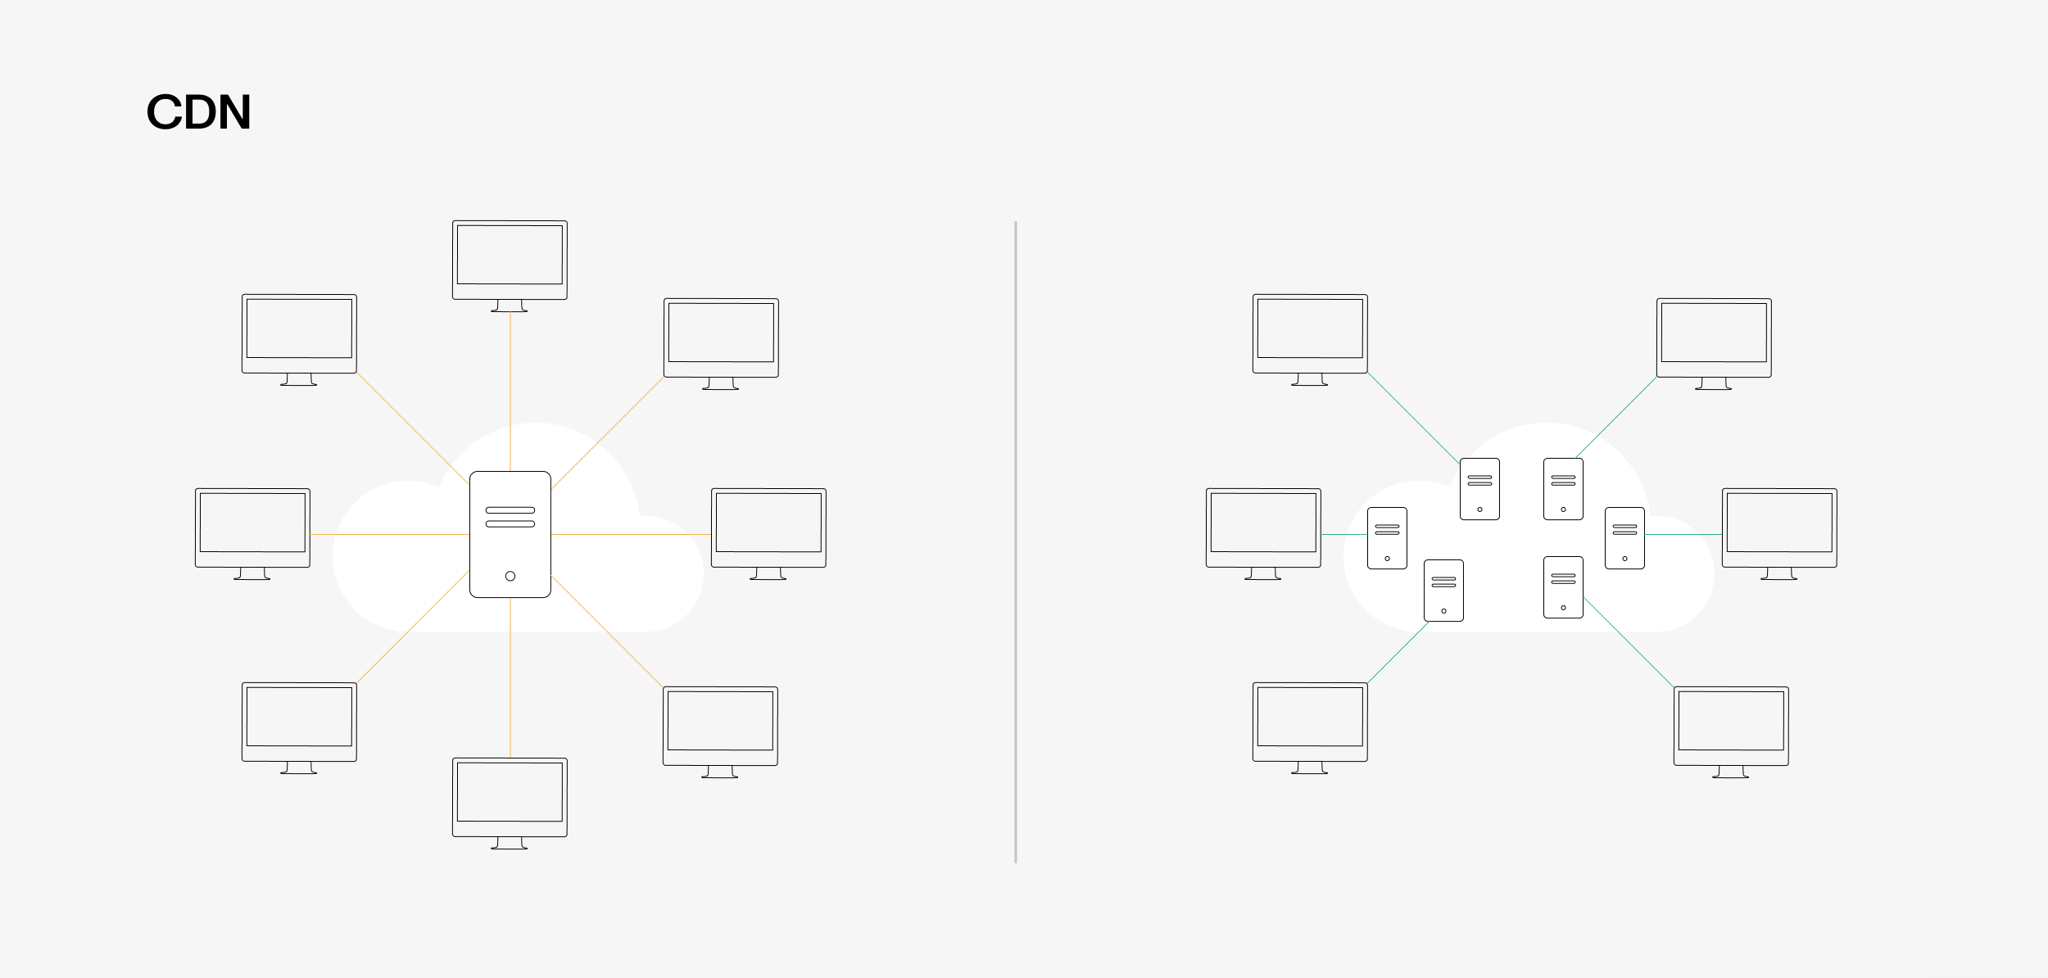 Centralized system versus decentralized network